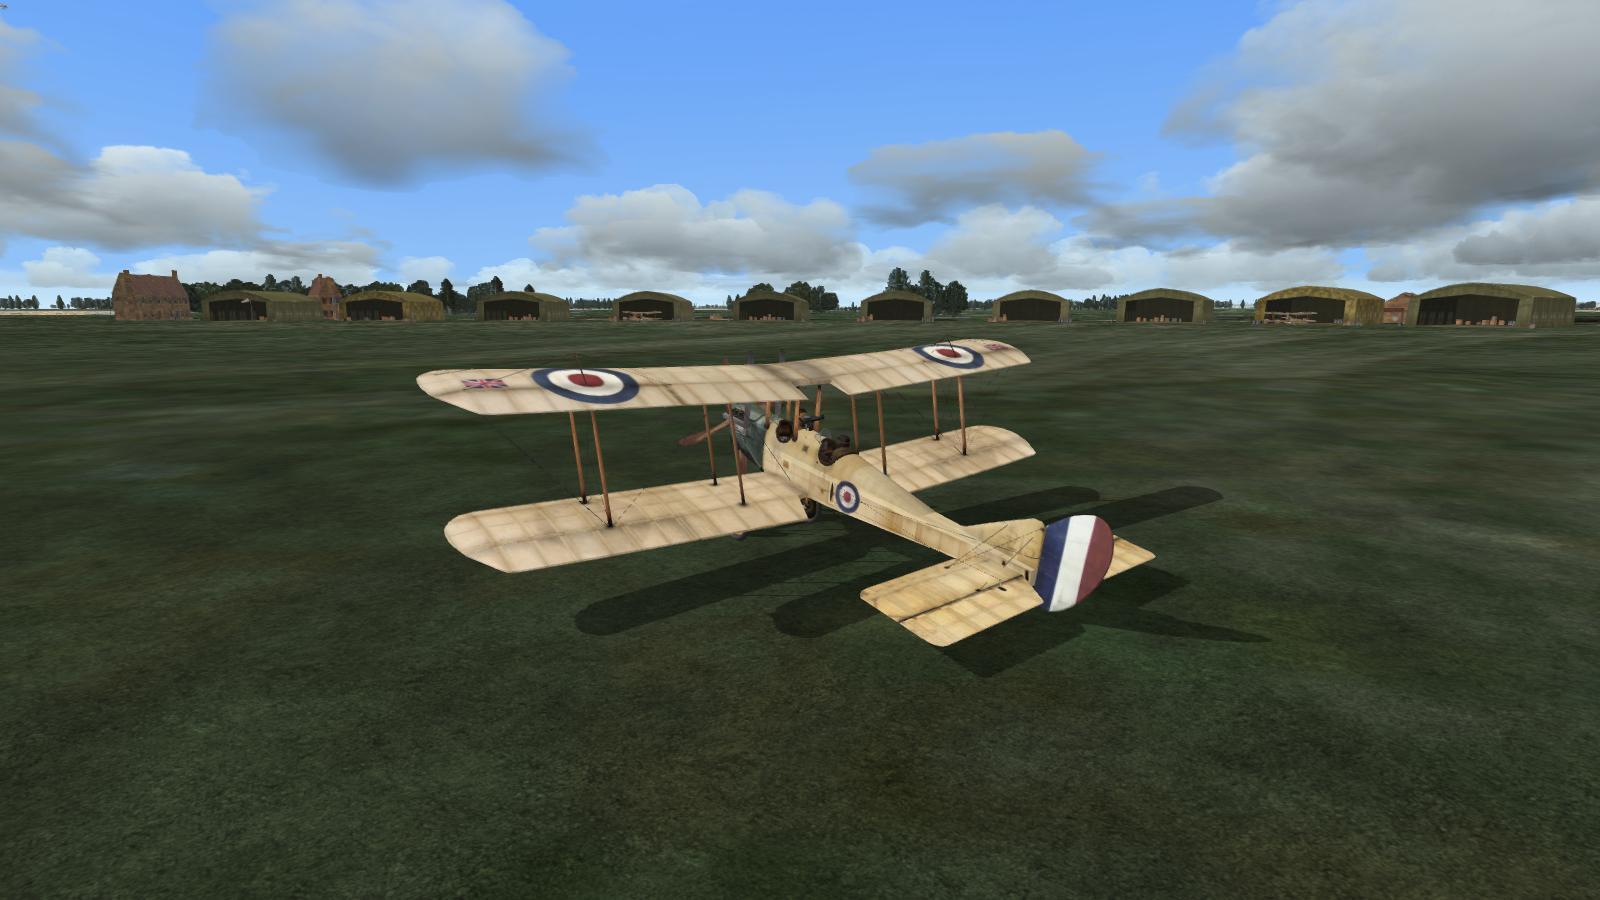 Wings Over Flanders Fields - BE2c, 16 Sqdn RFC, la Gorgue aerodrome, May 1915